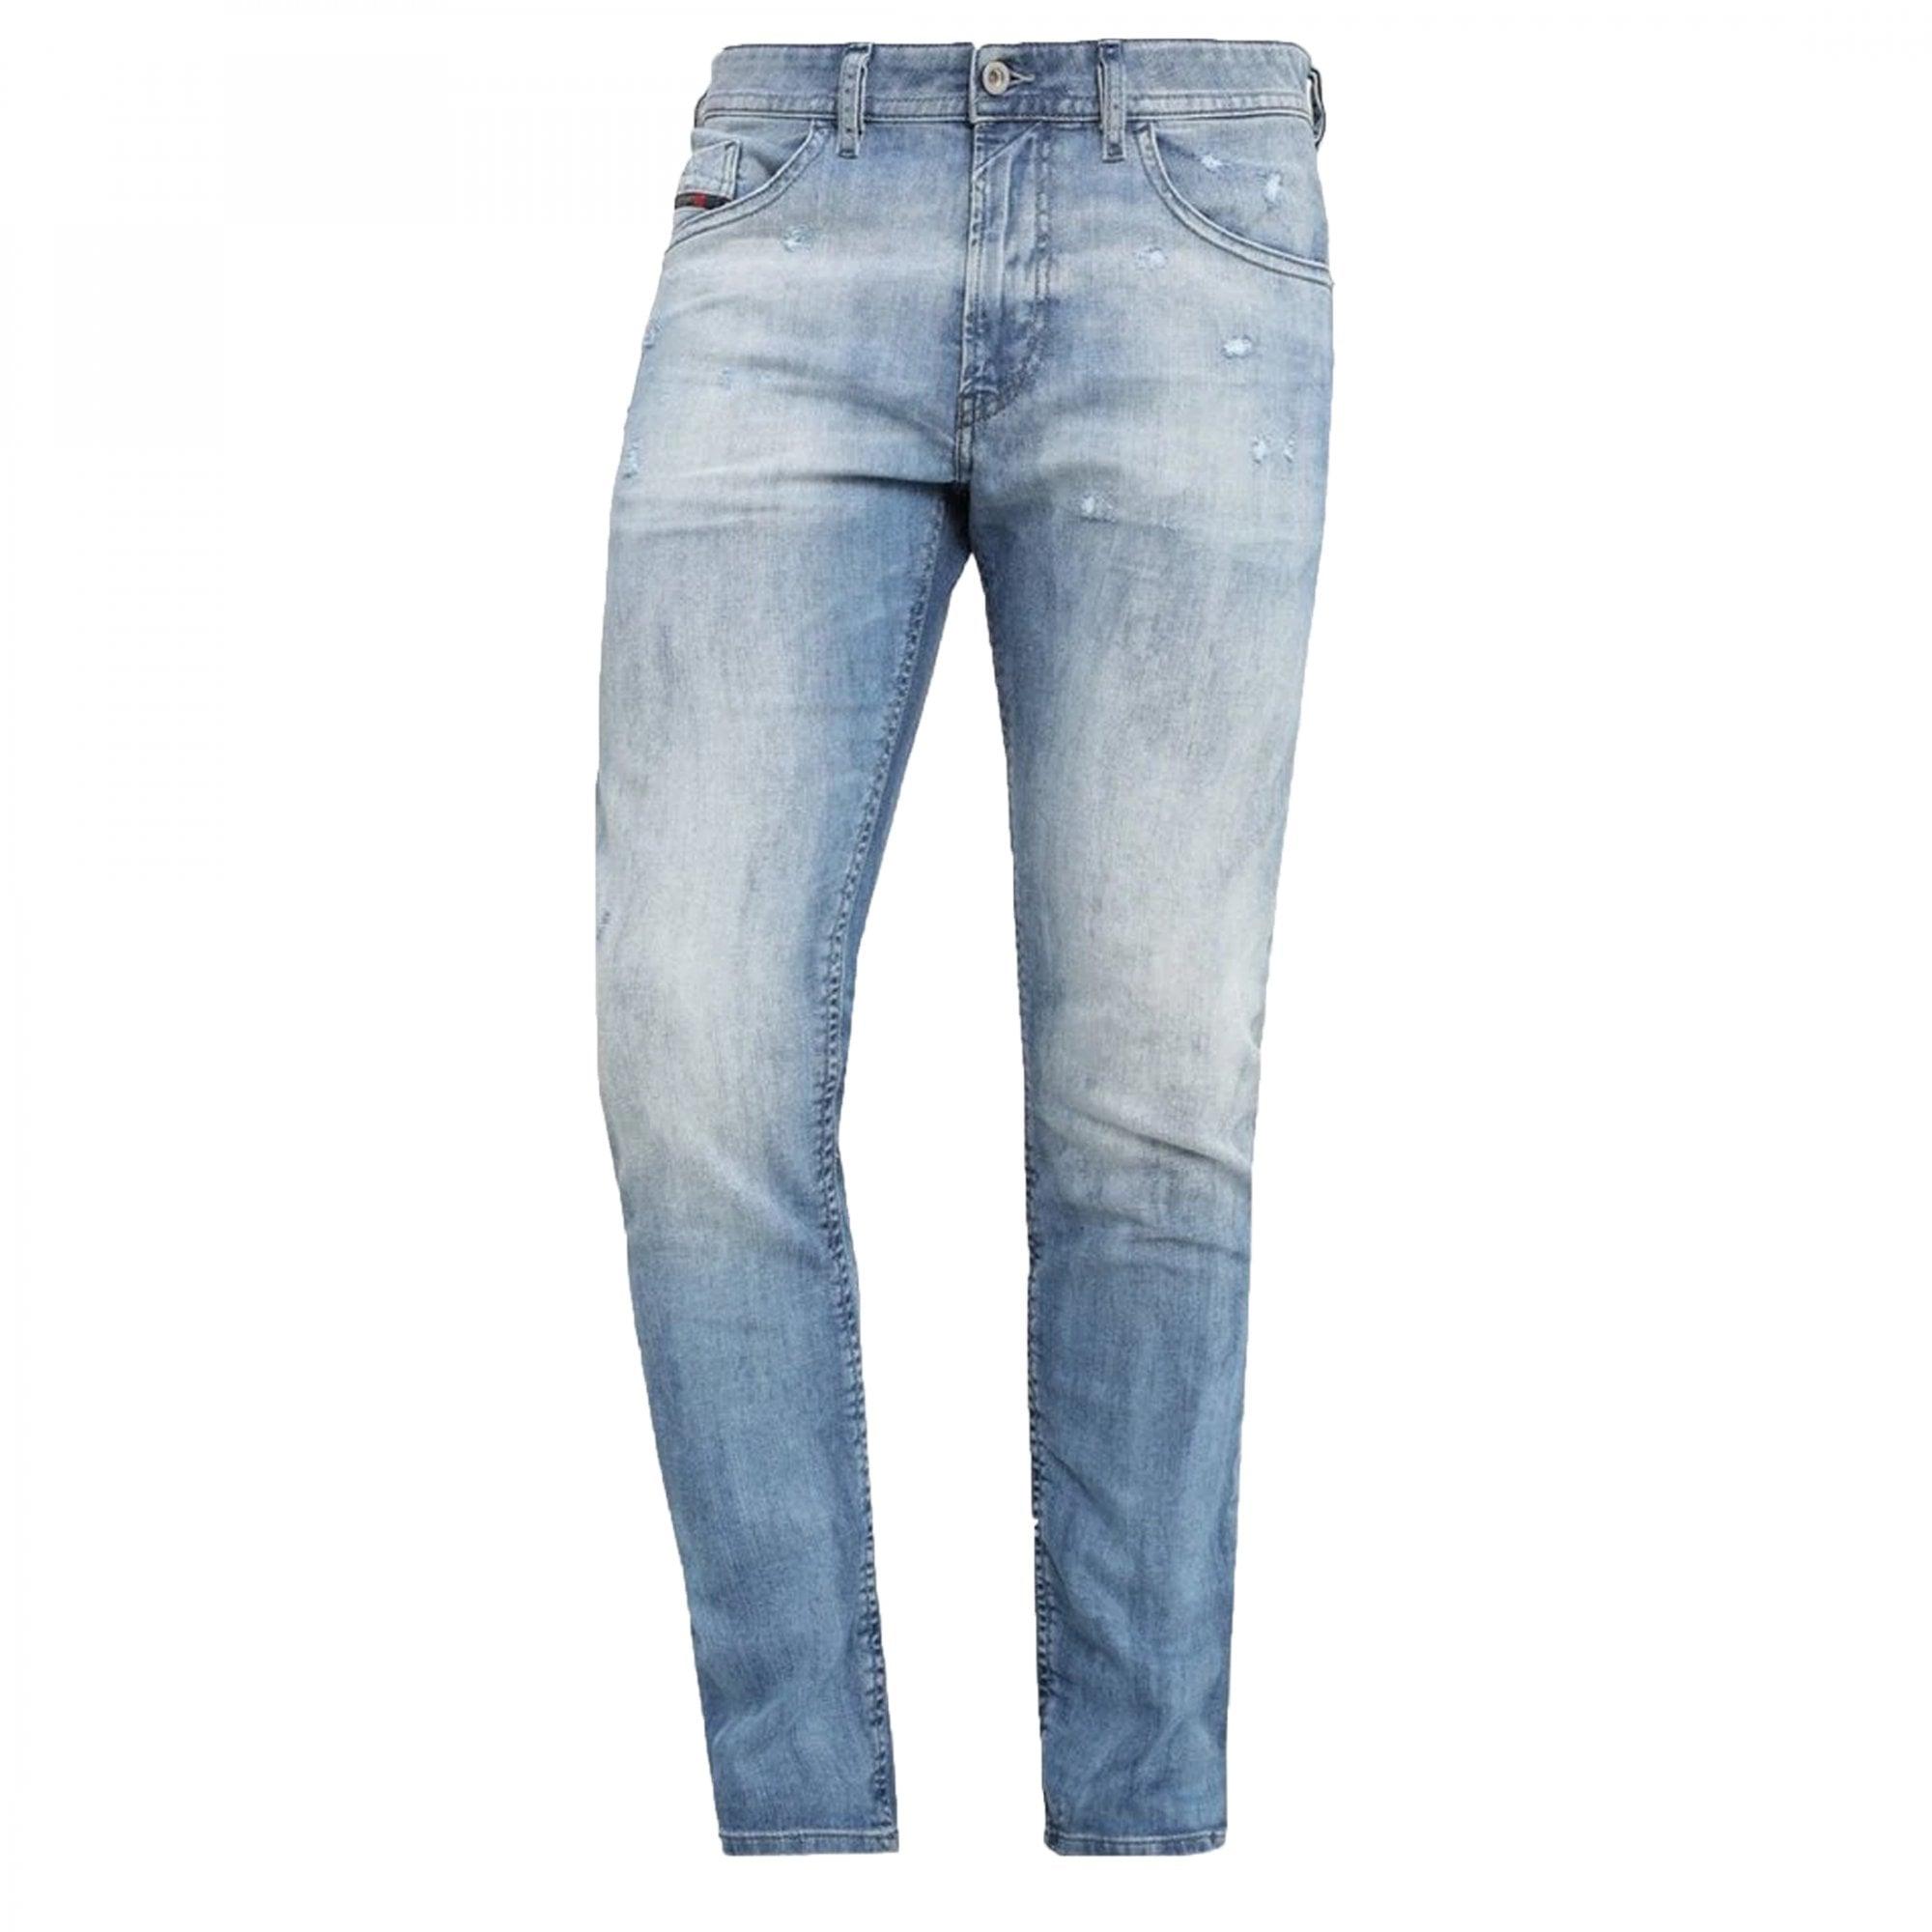 DIESEL thommer 081AS Slim-Skinny Fit Light Blue Jean Denim Jeans LIGHT MID